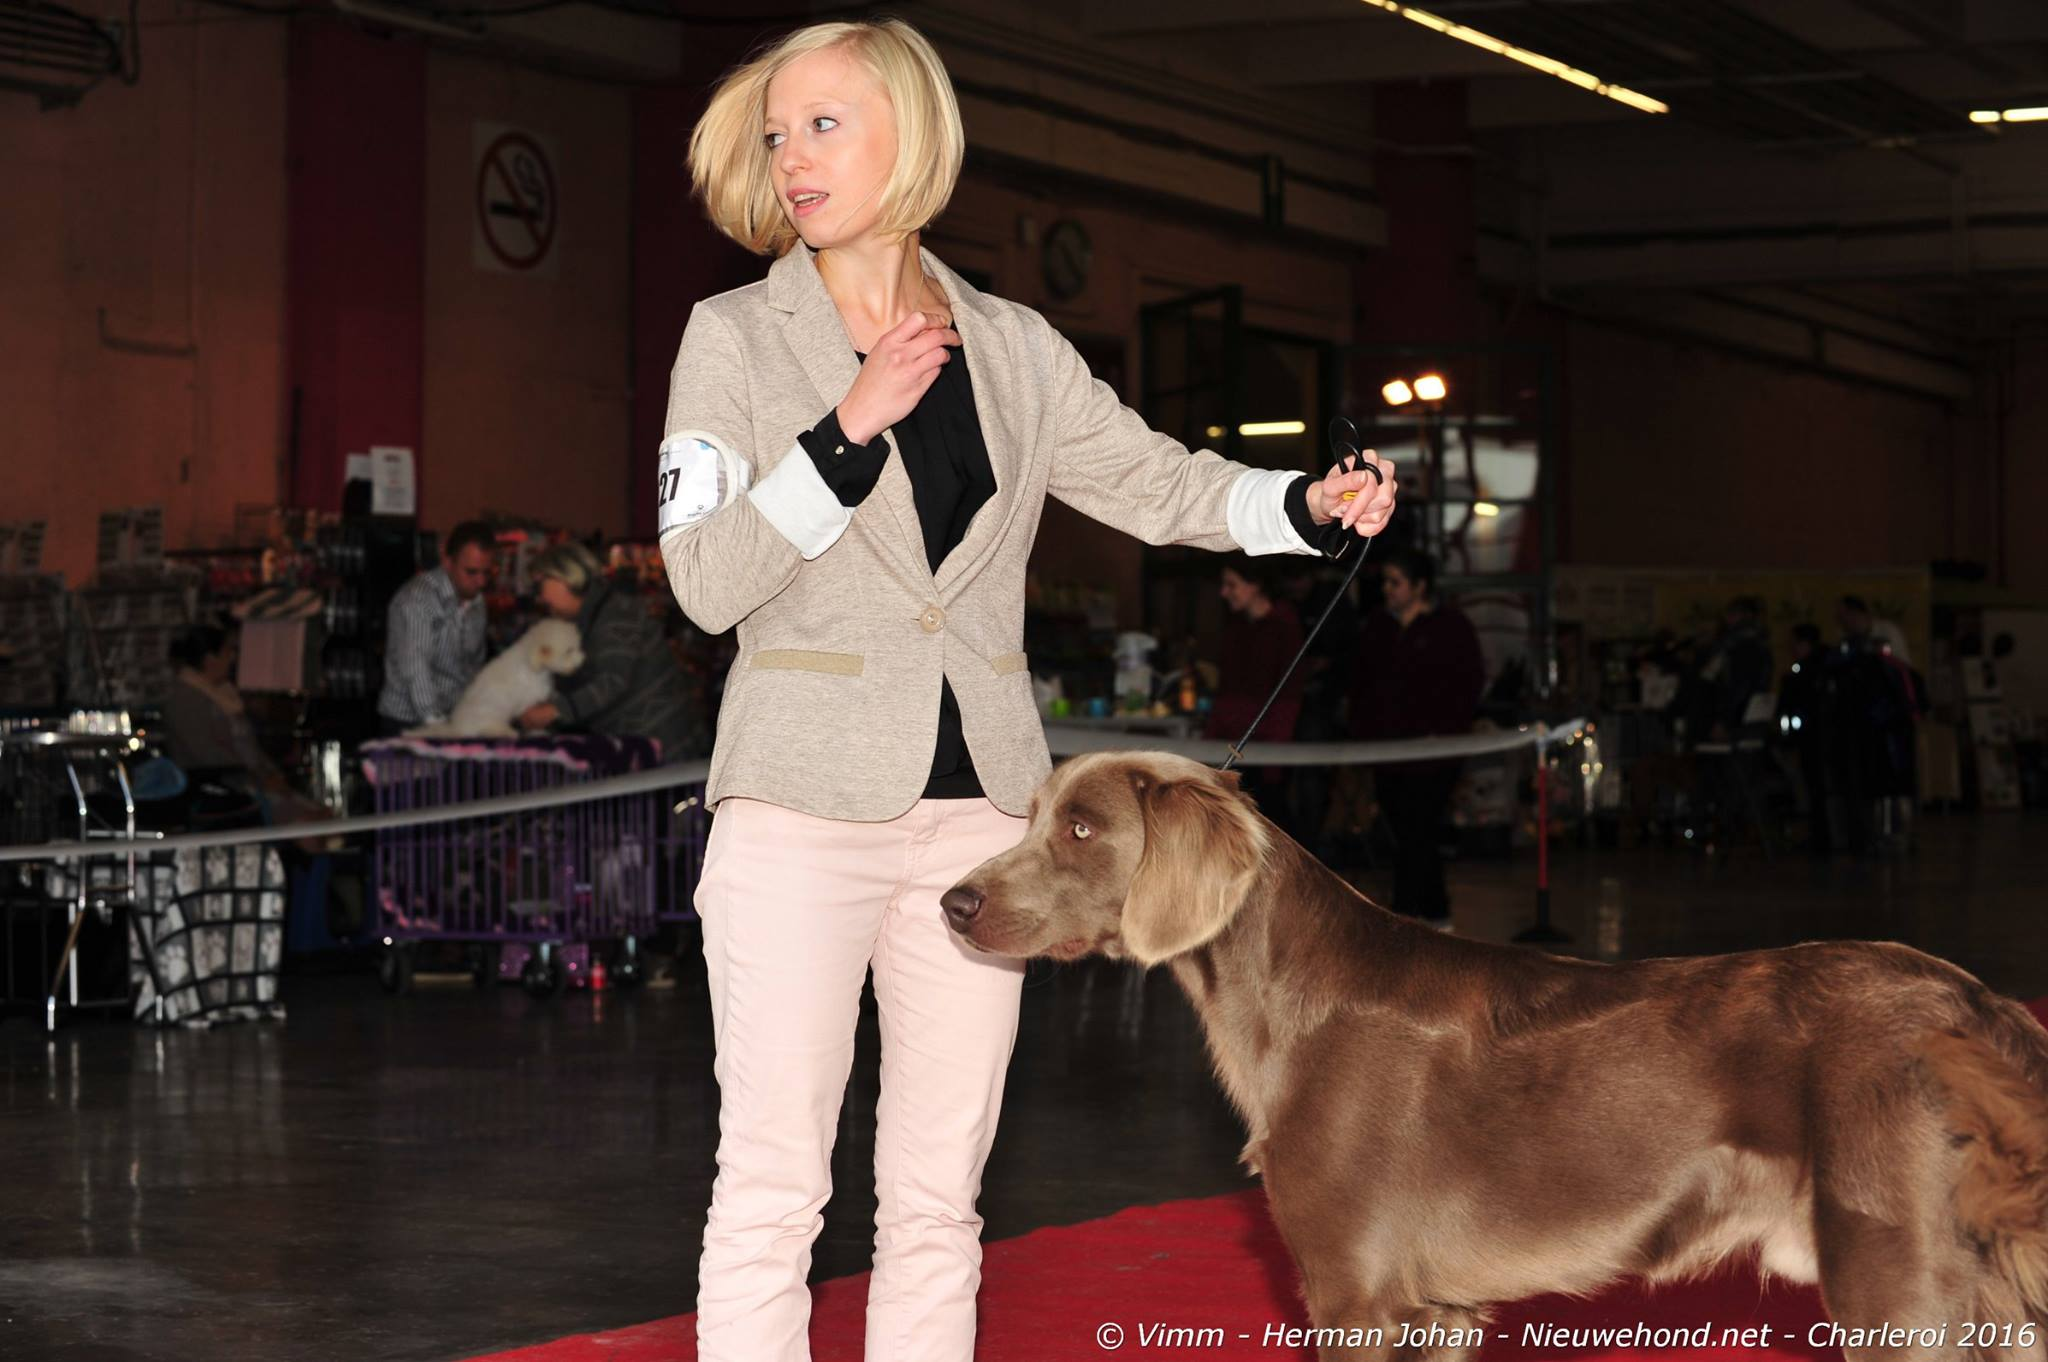 dogshow-de-nieuwehond